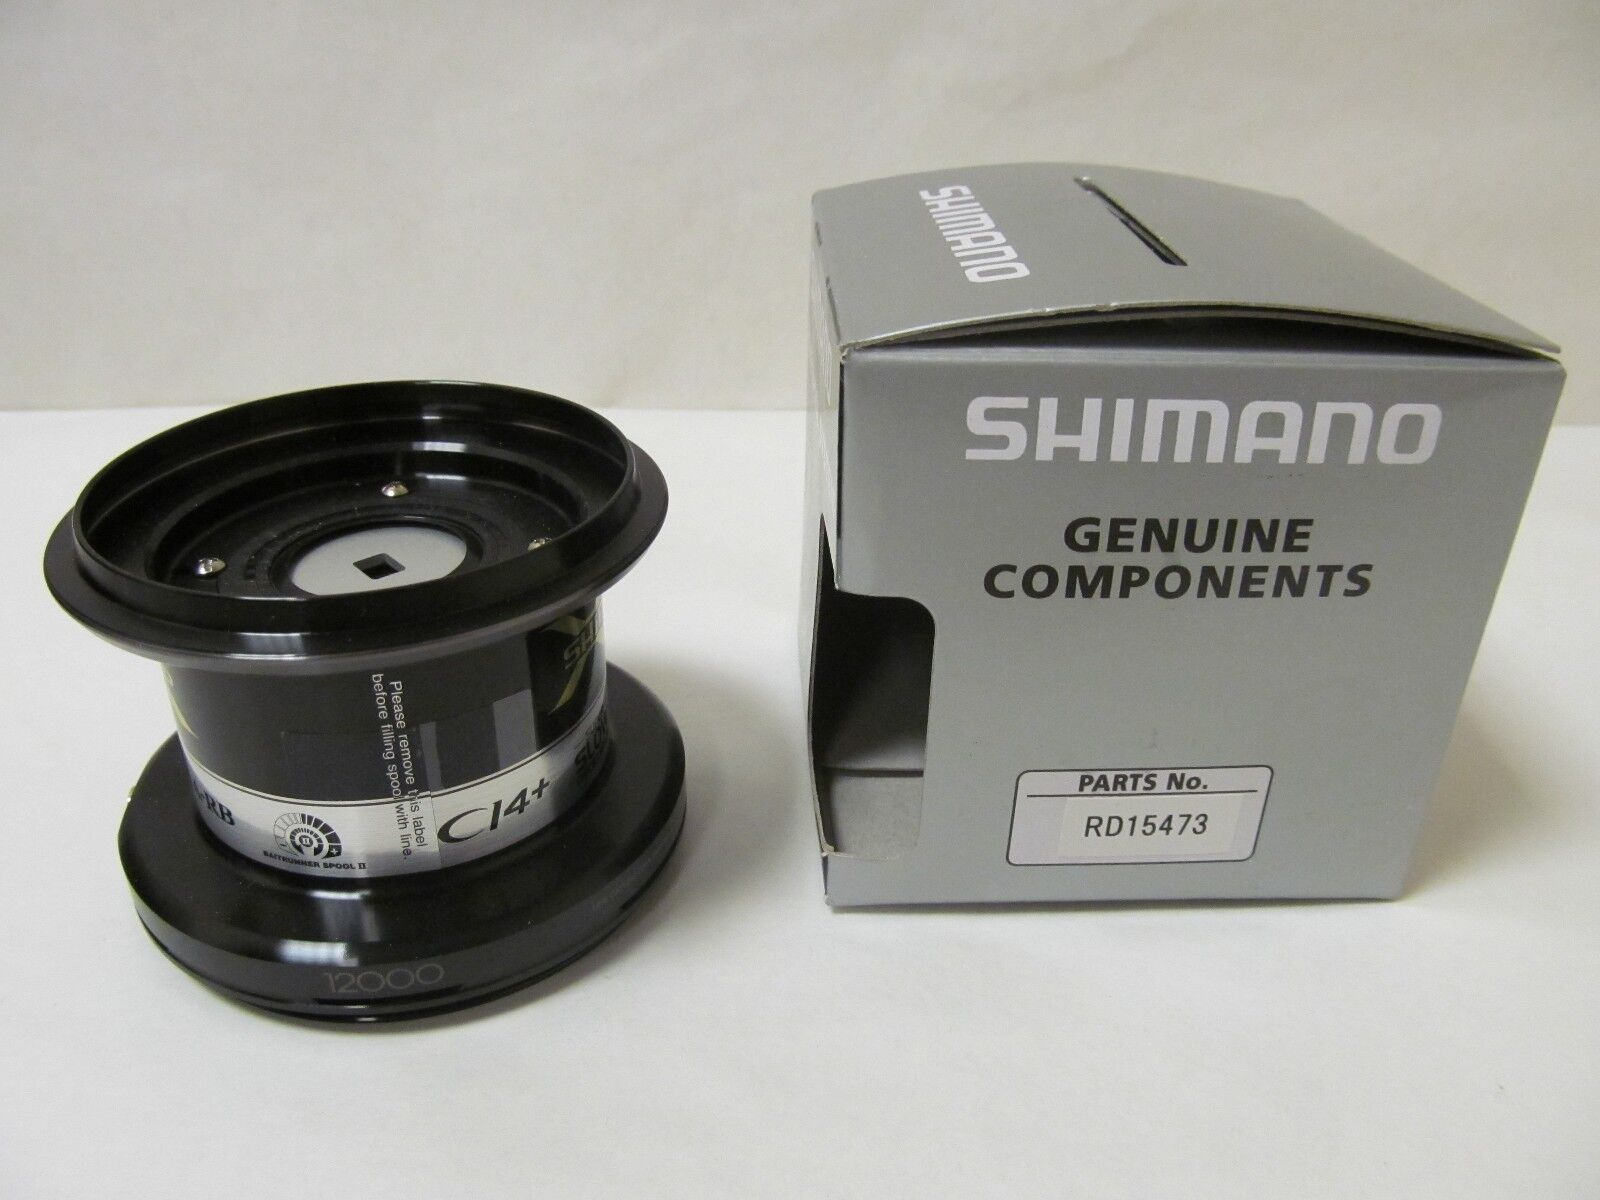 SHIhommeO SPARE SPOOL TO FIT AERO TECHNIUM MGS 12000 XT-B (RD 15473)